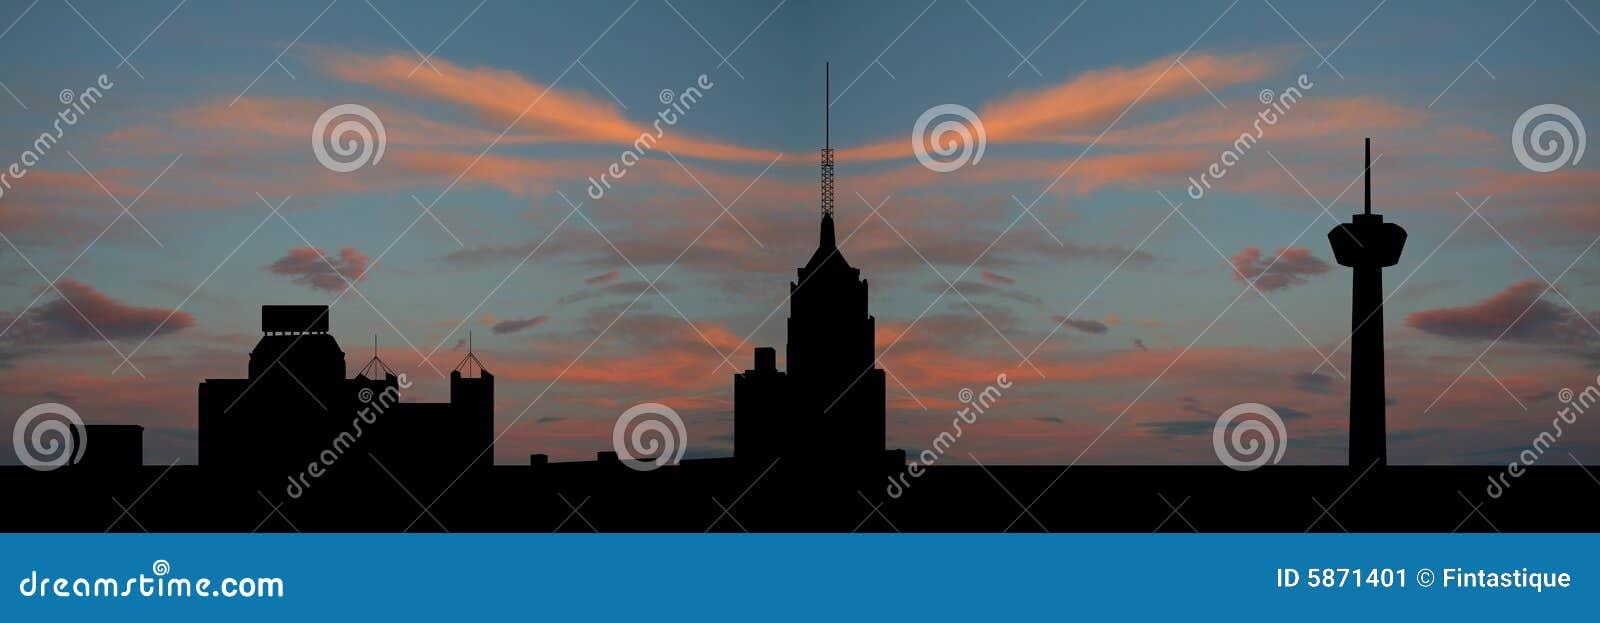 Antoniosan solnedgång